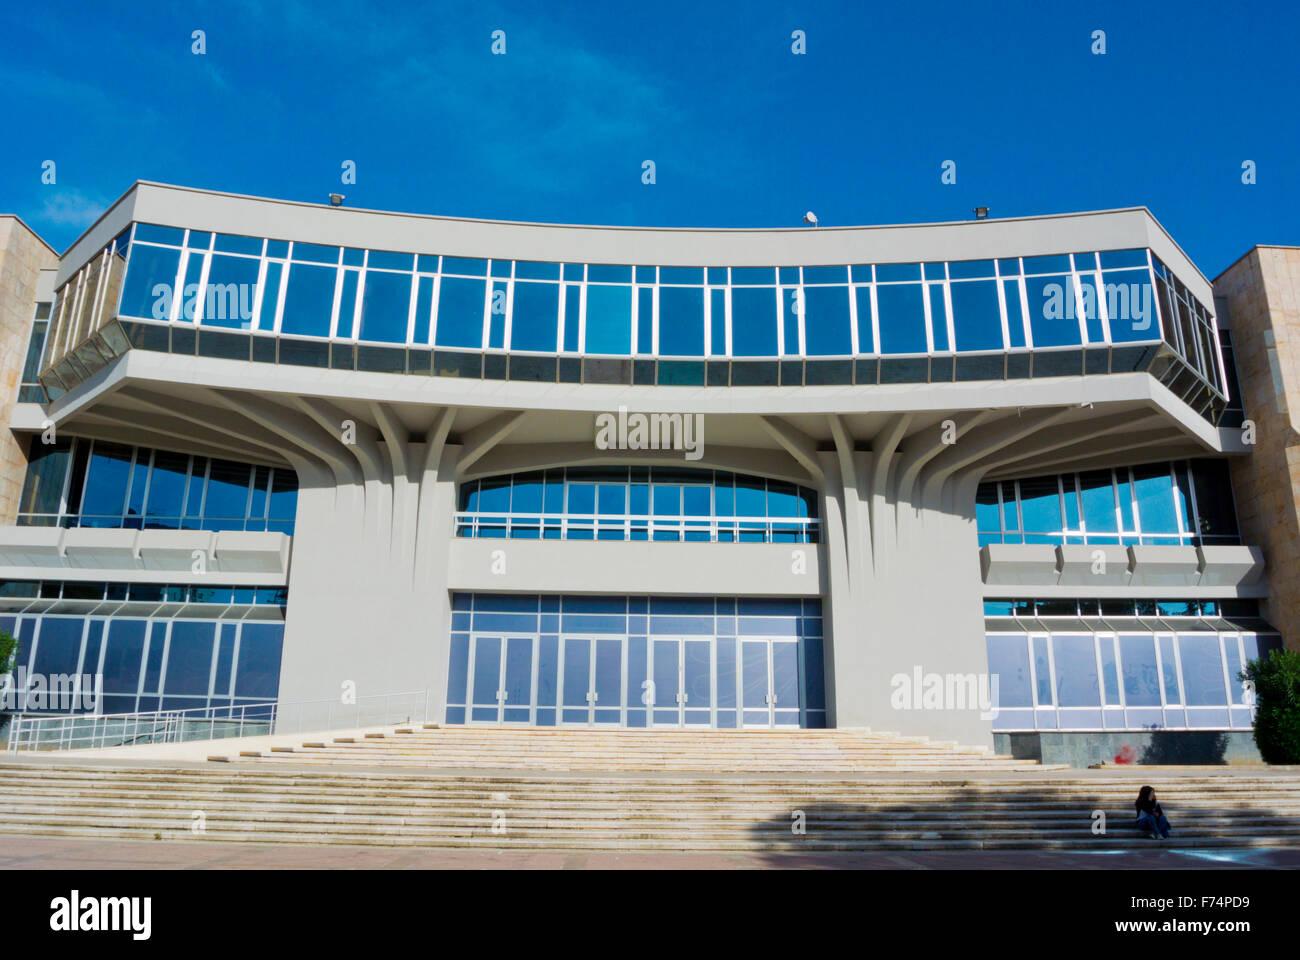 Pallati i Kongreseve,  Palace of Congresses, Tirana, Albania - Stock Image